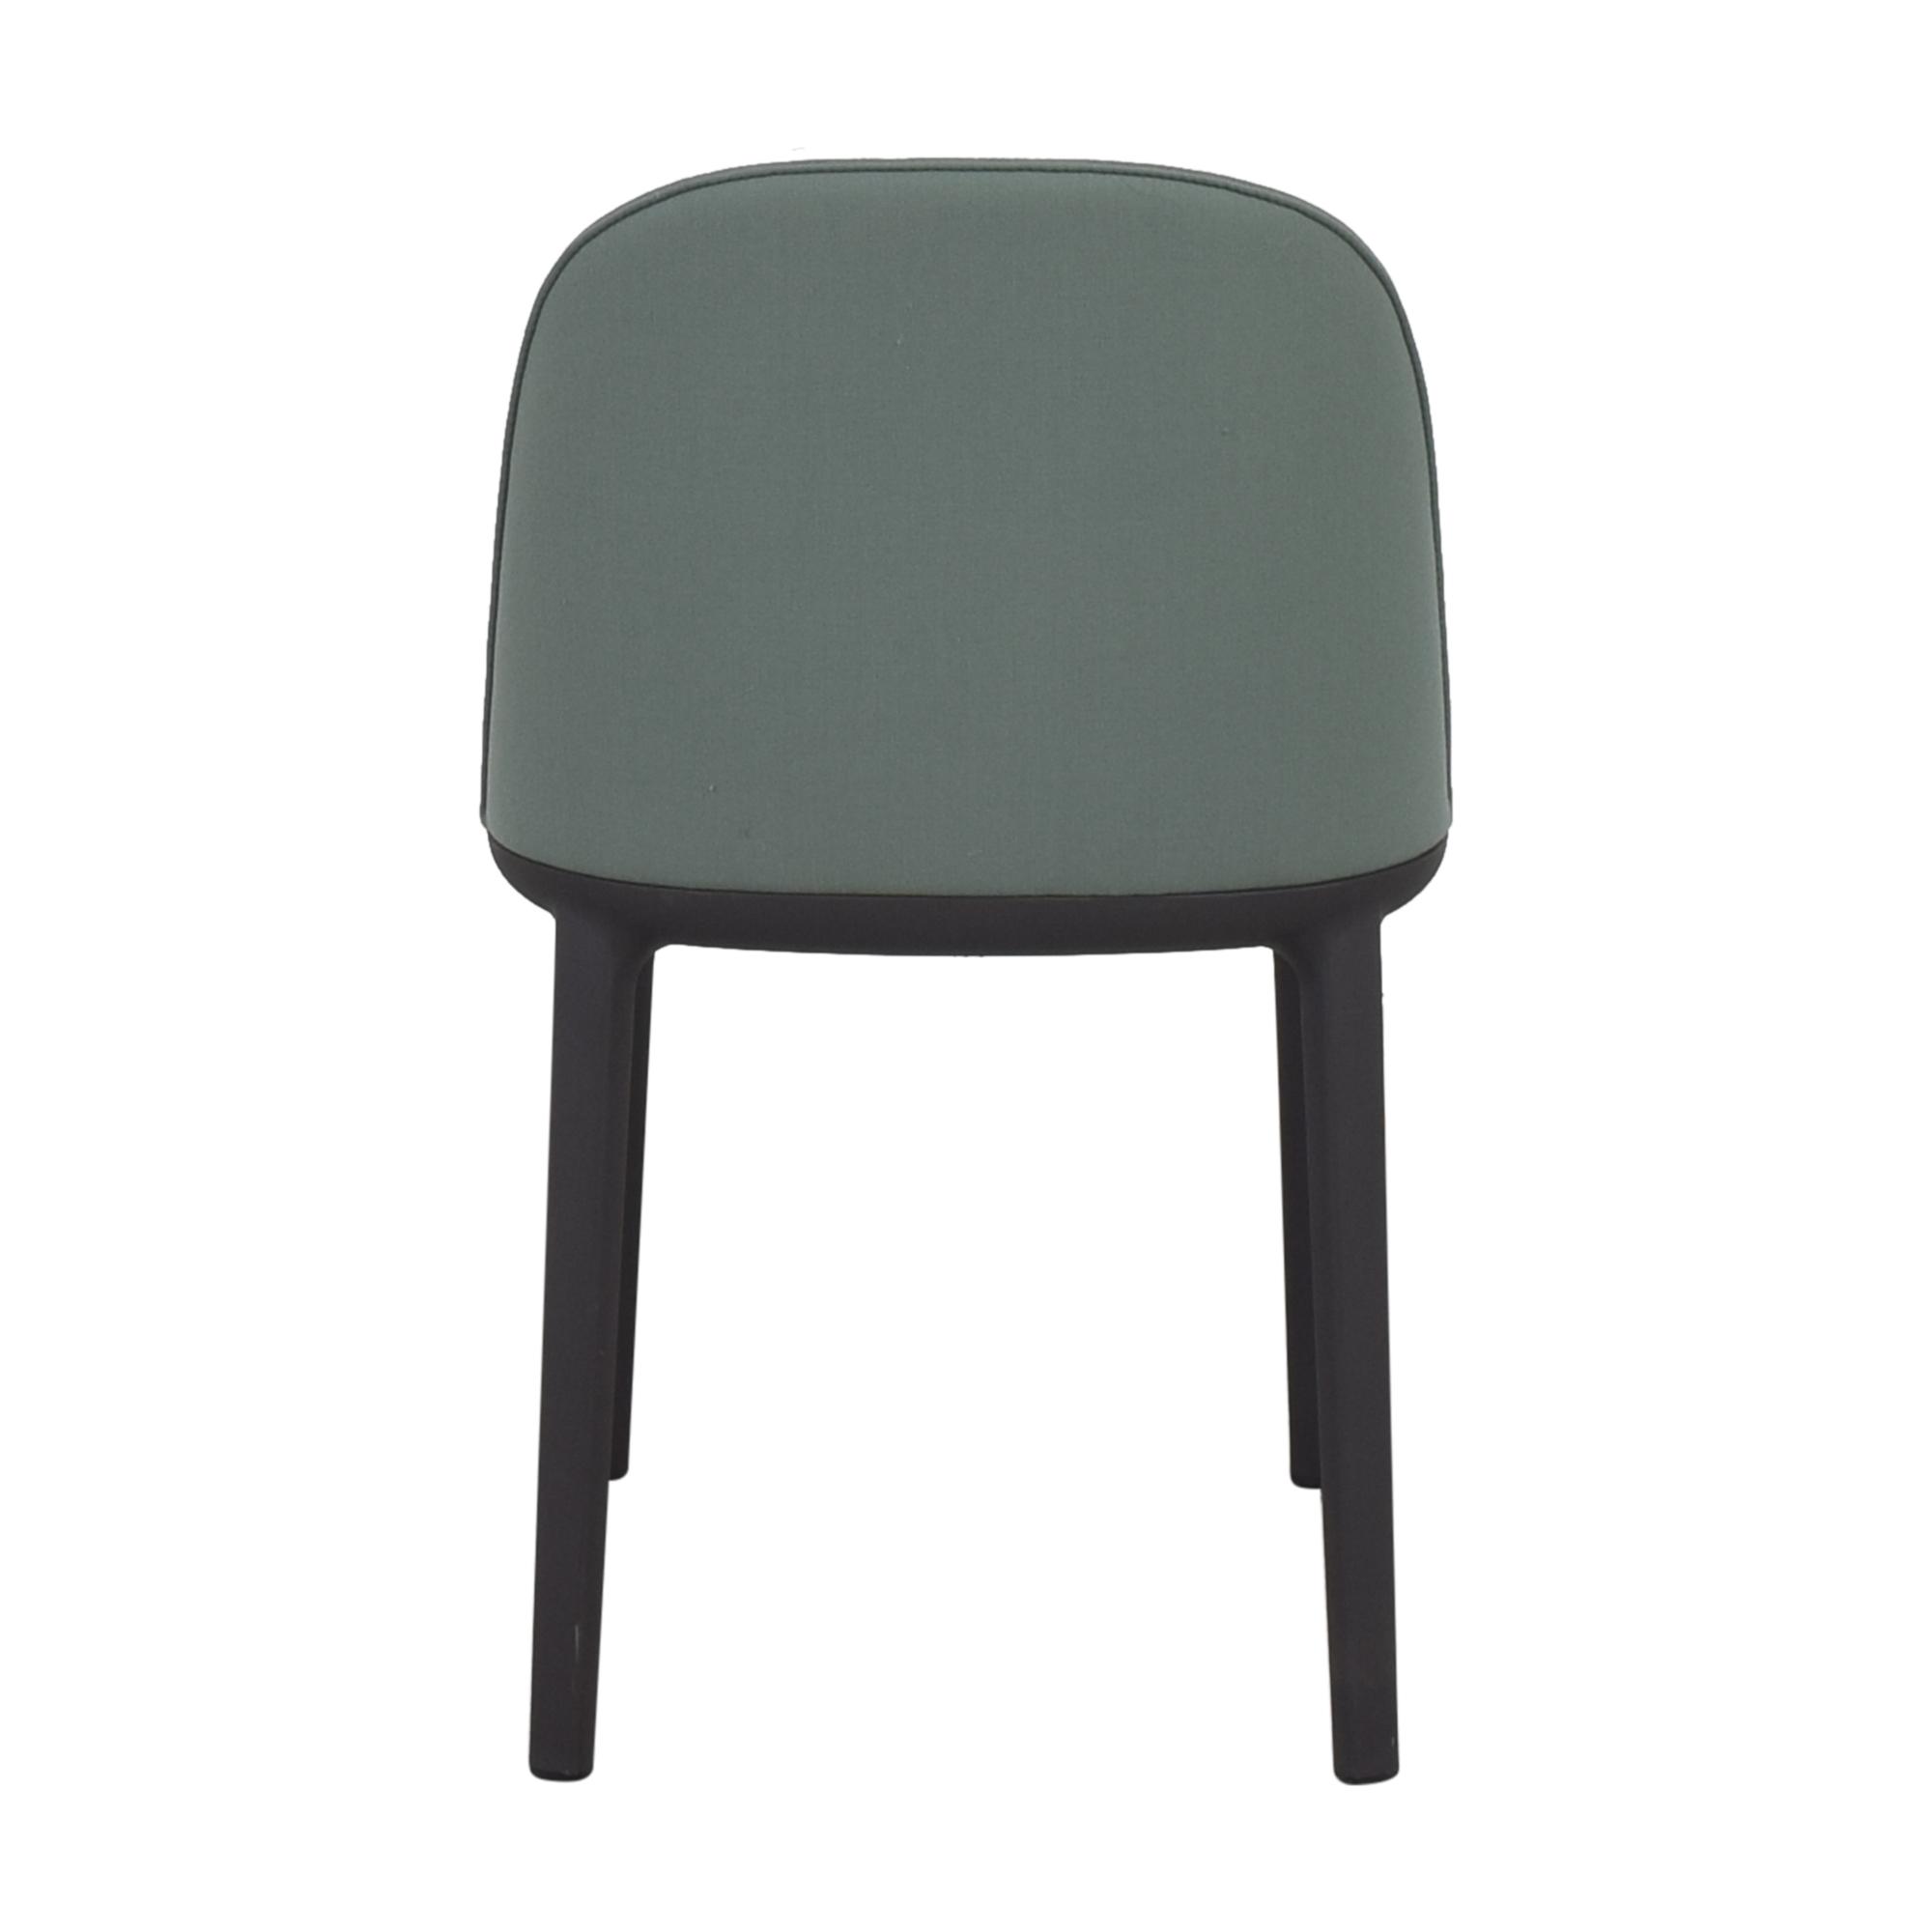 Vitra Vitra Softshell Side Chair used